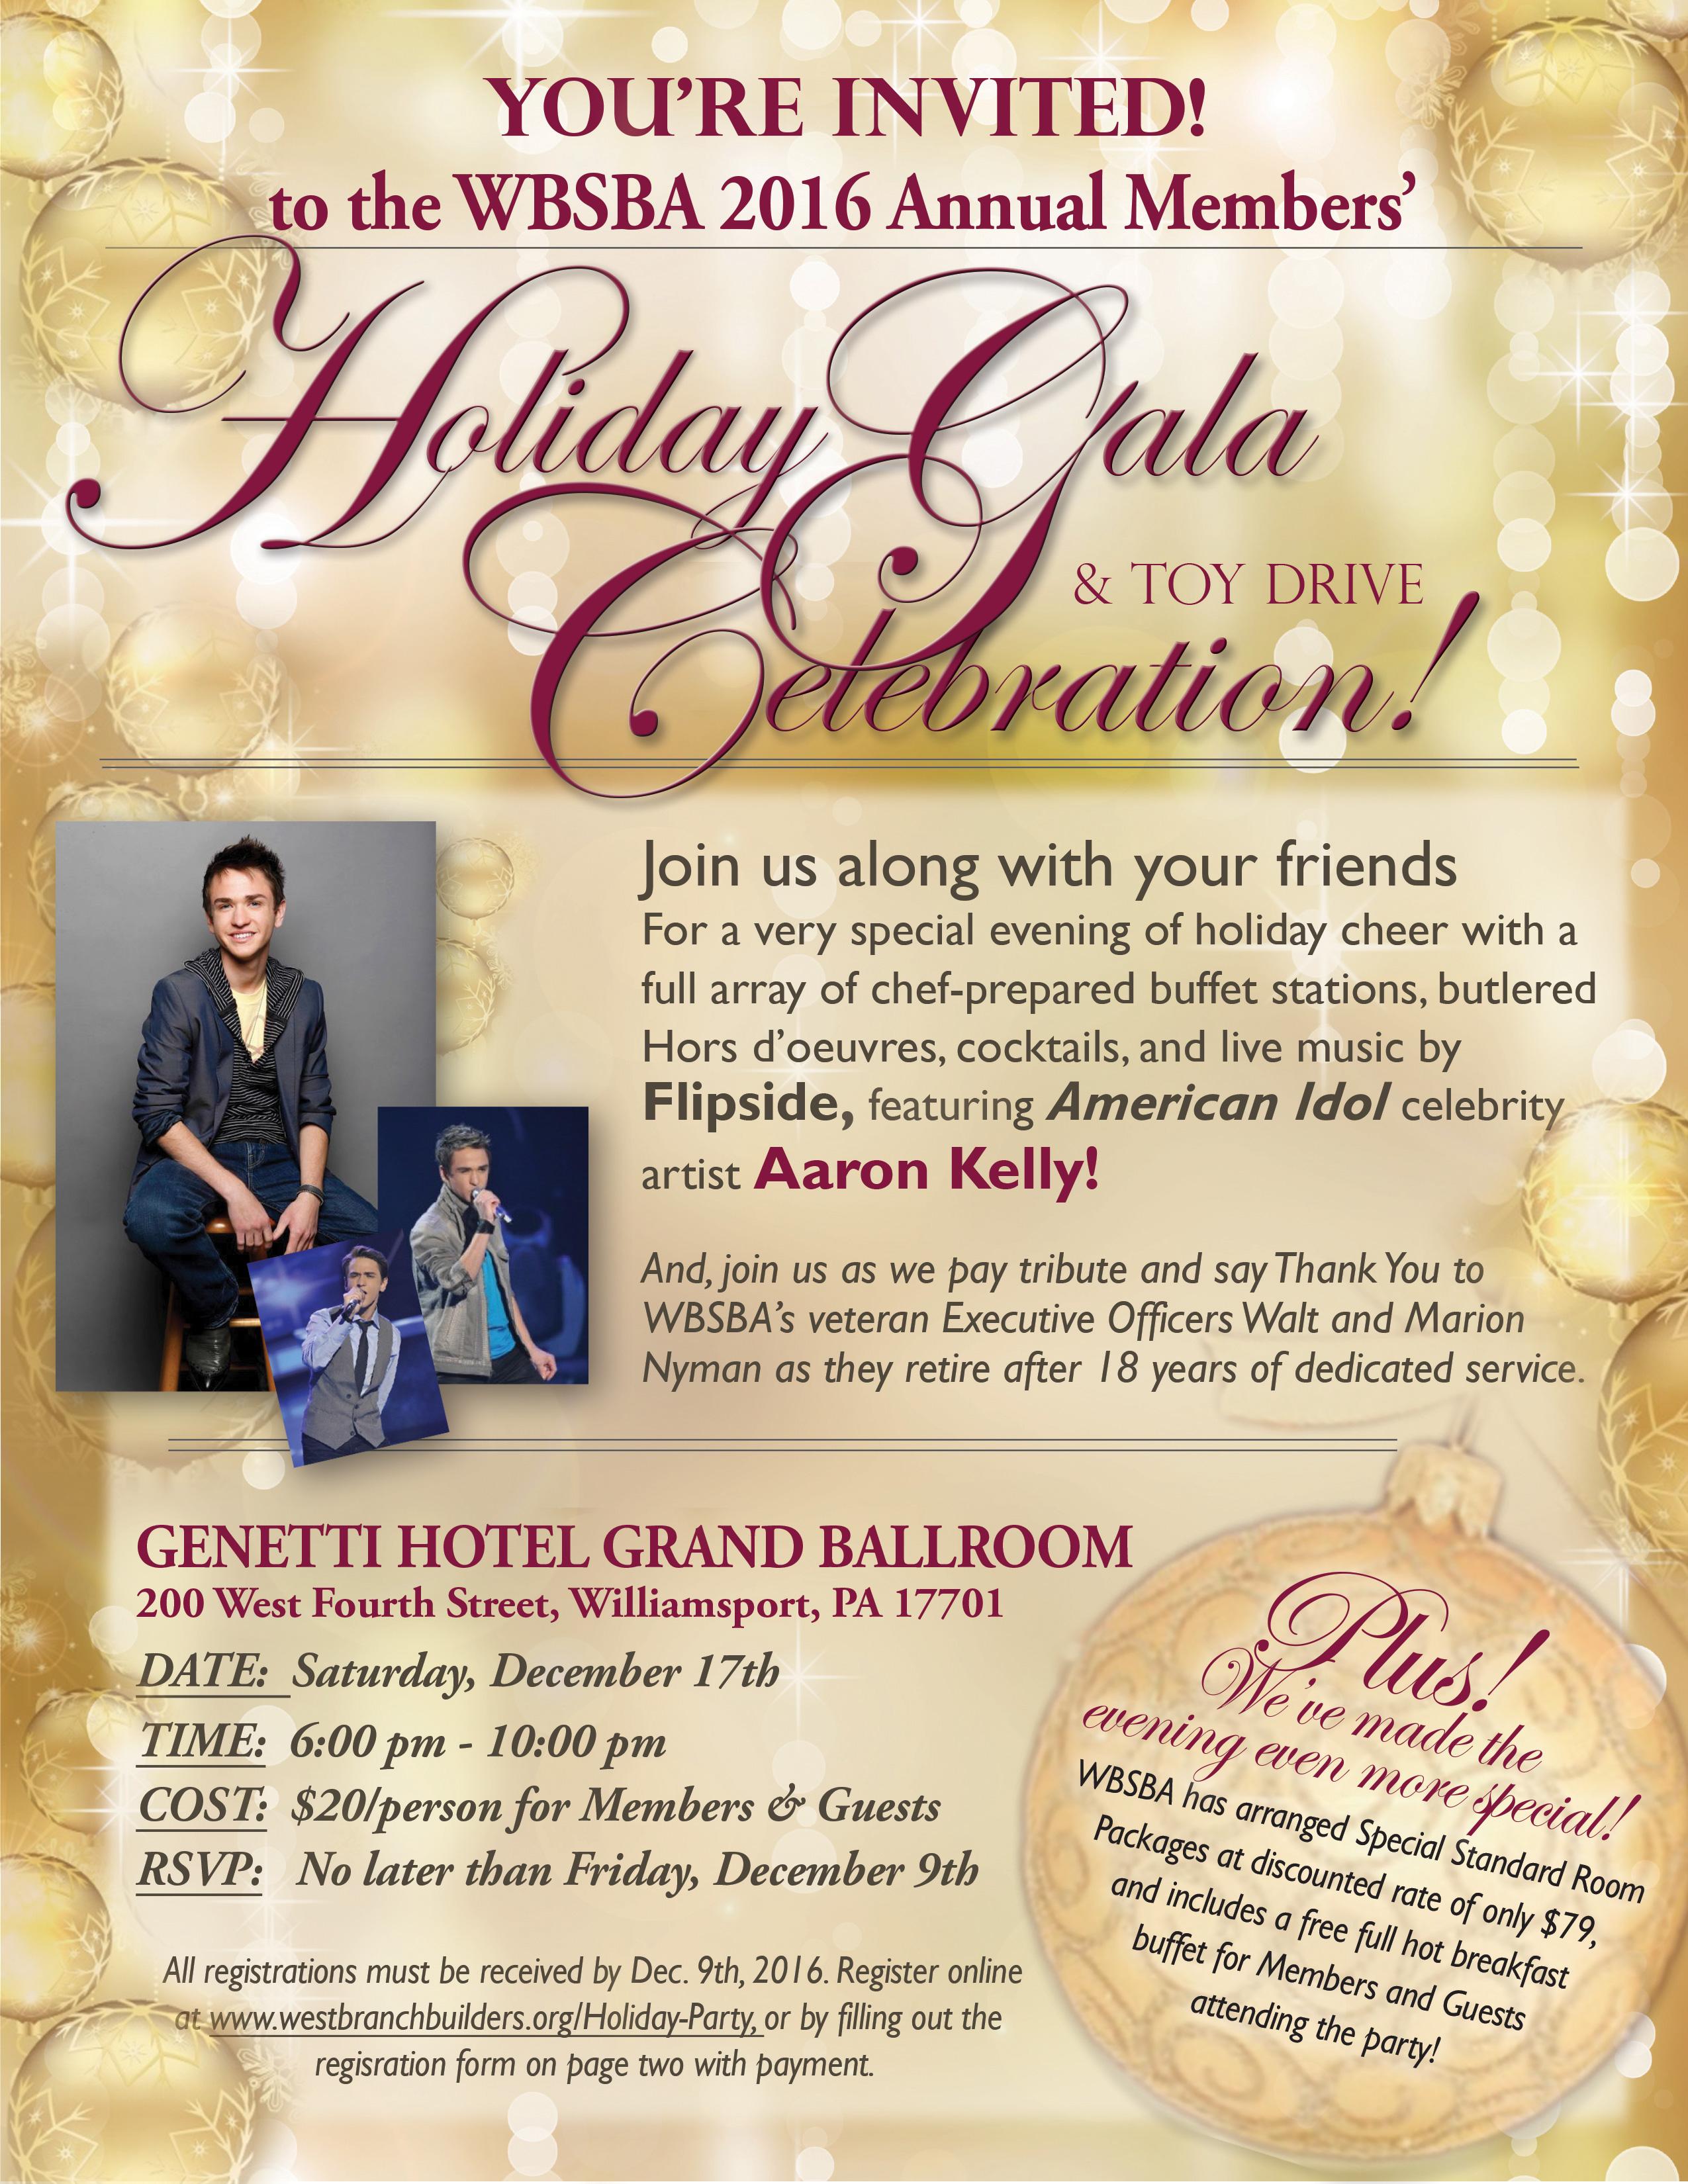 Holiday-Gala-Invitation_opt.jpg